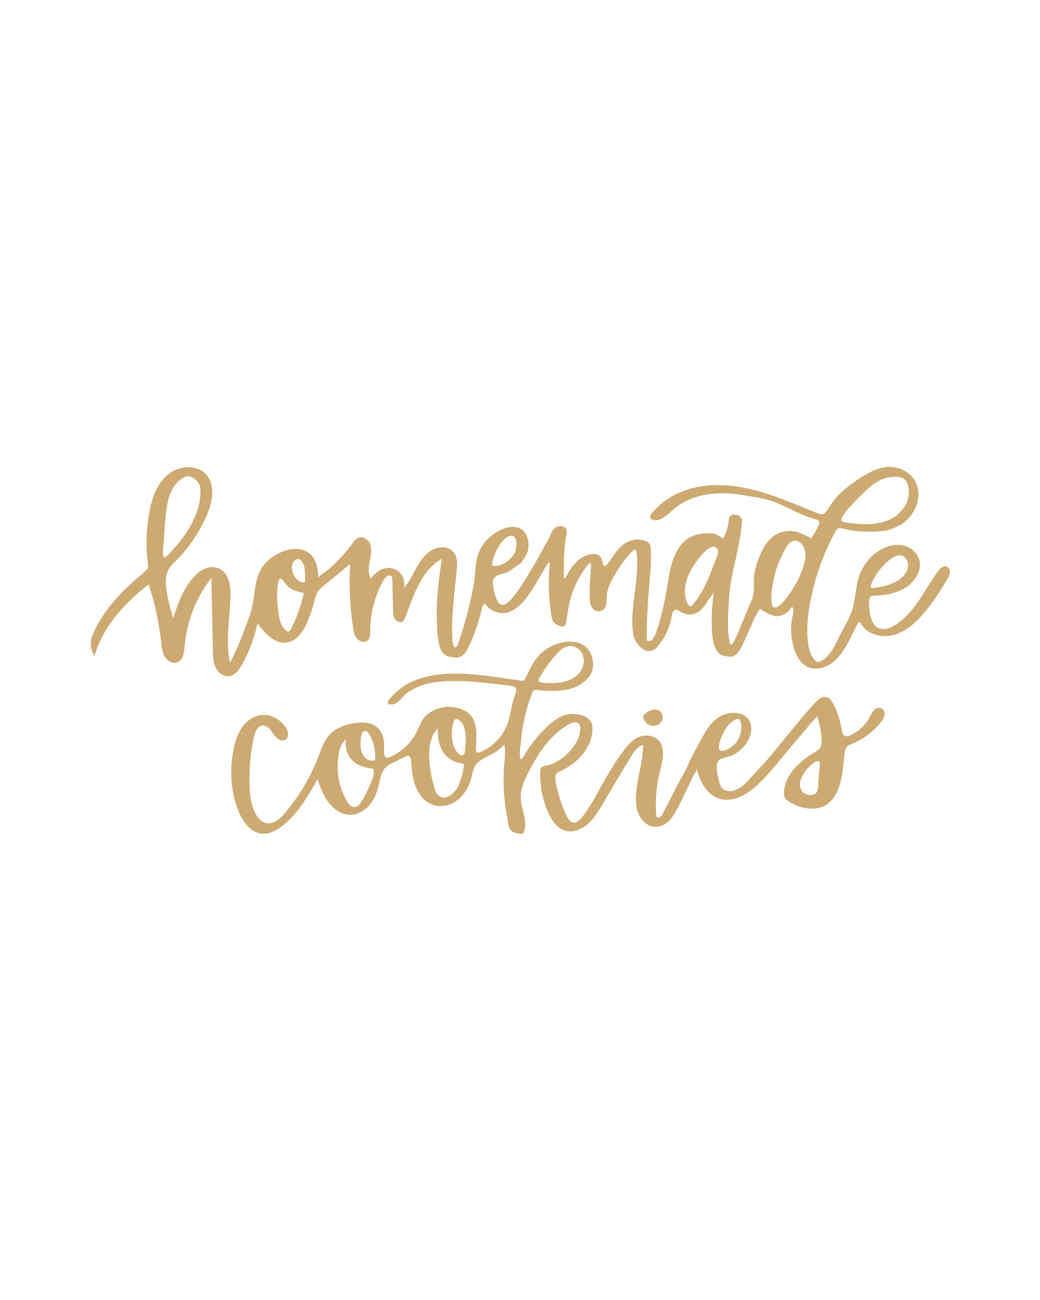 calligraphy of homemade cookies